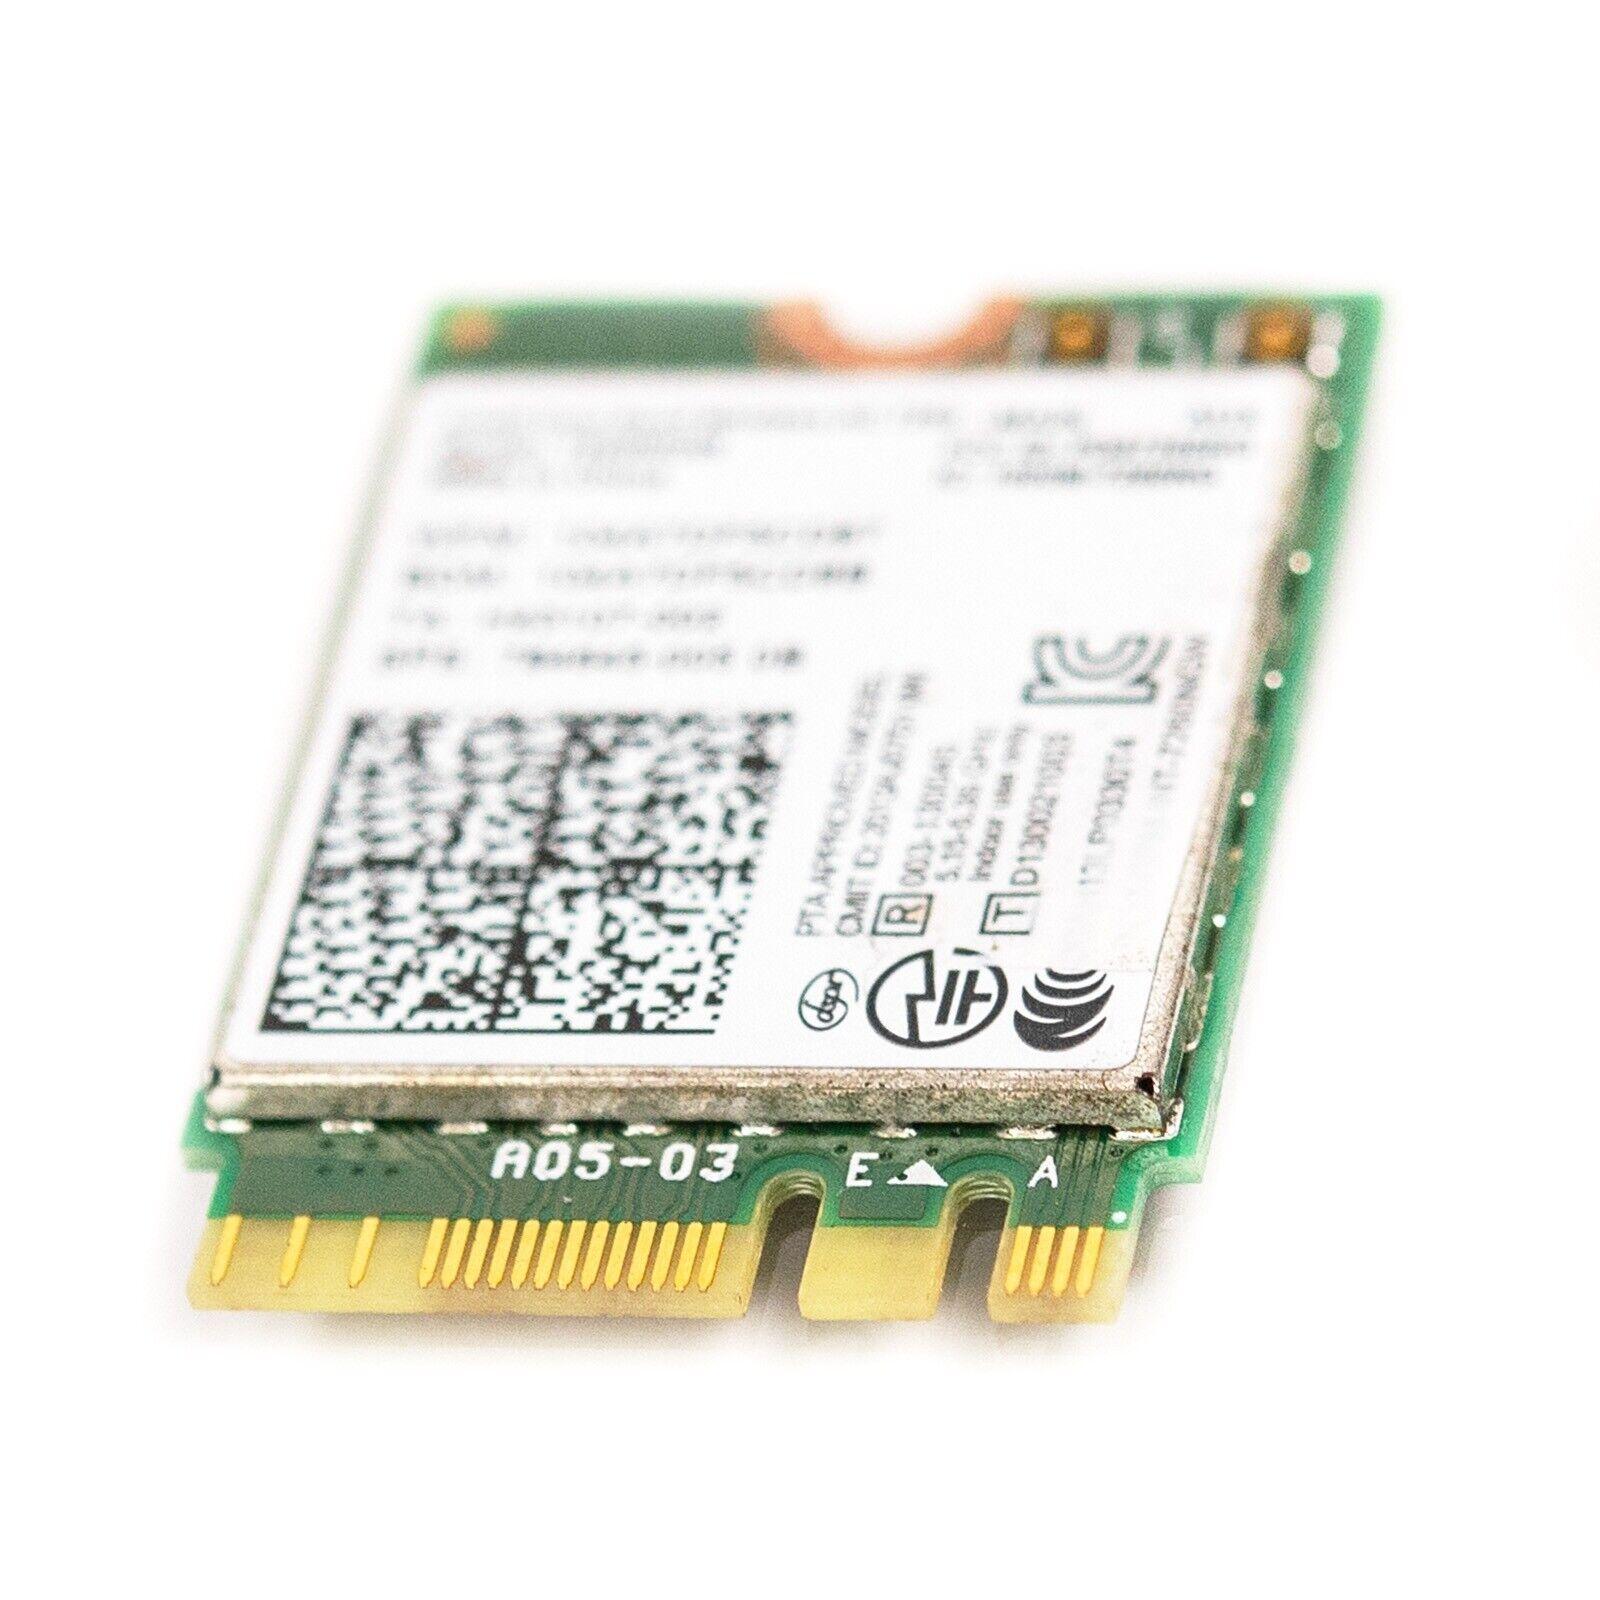 HP Chromebook 11 G4 G5 Laptop Part Intel WiFi Wireless Card 784645-005